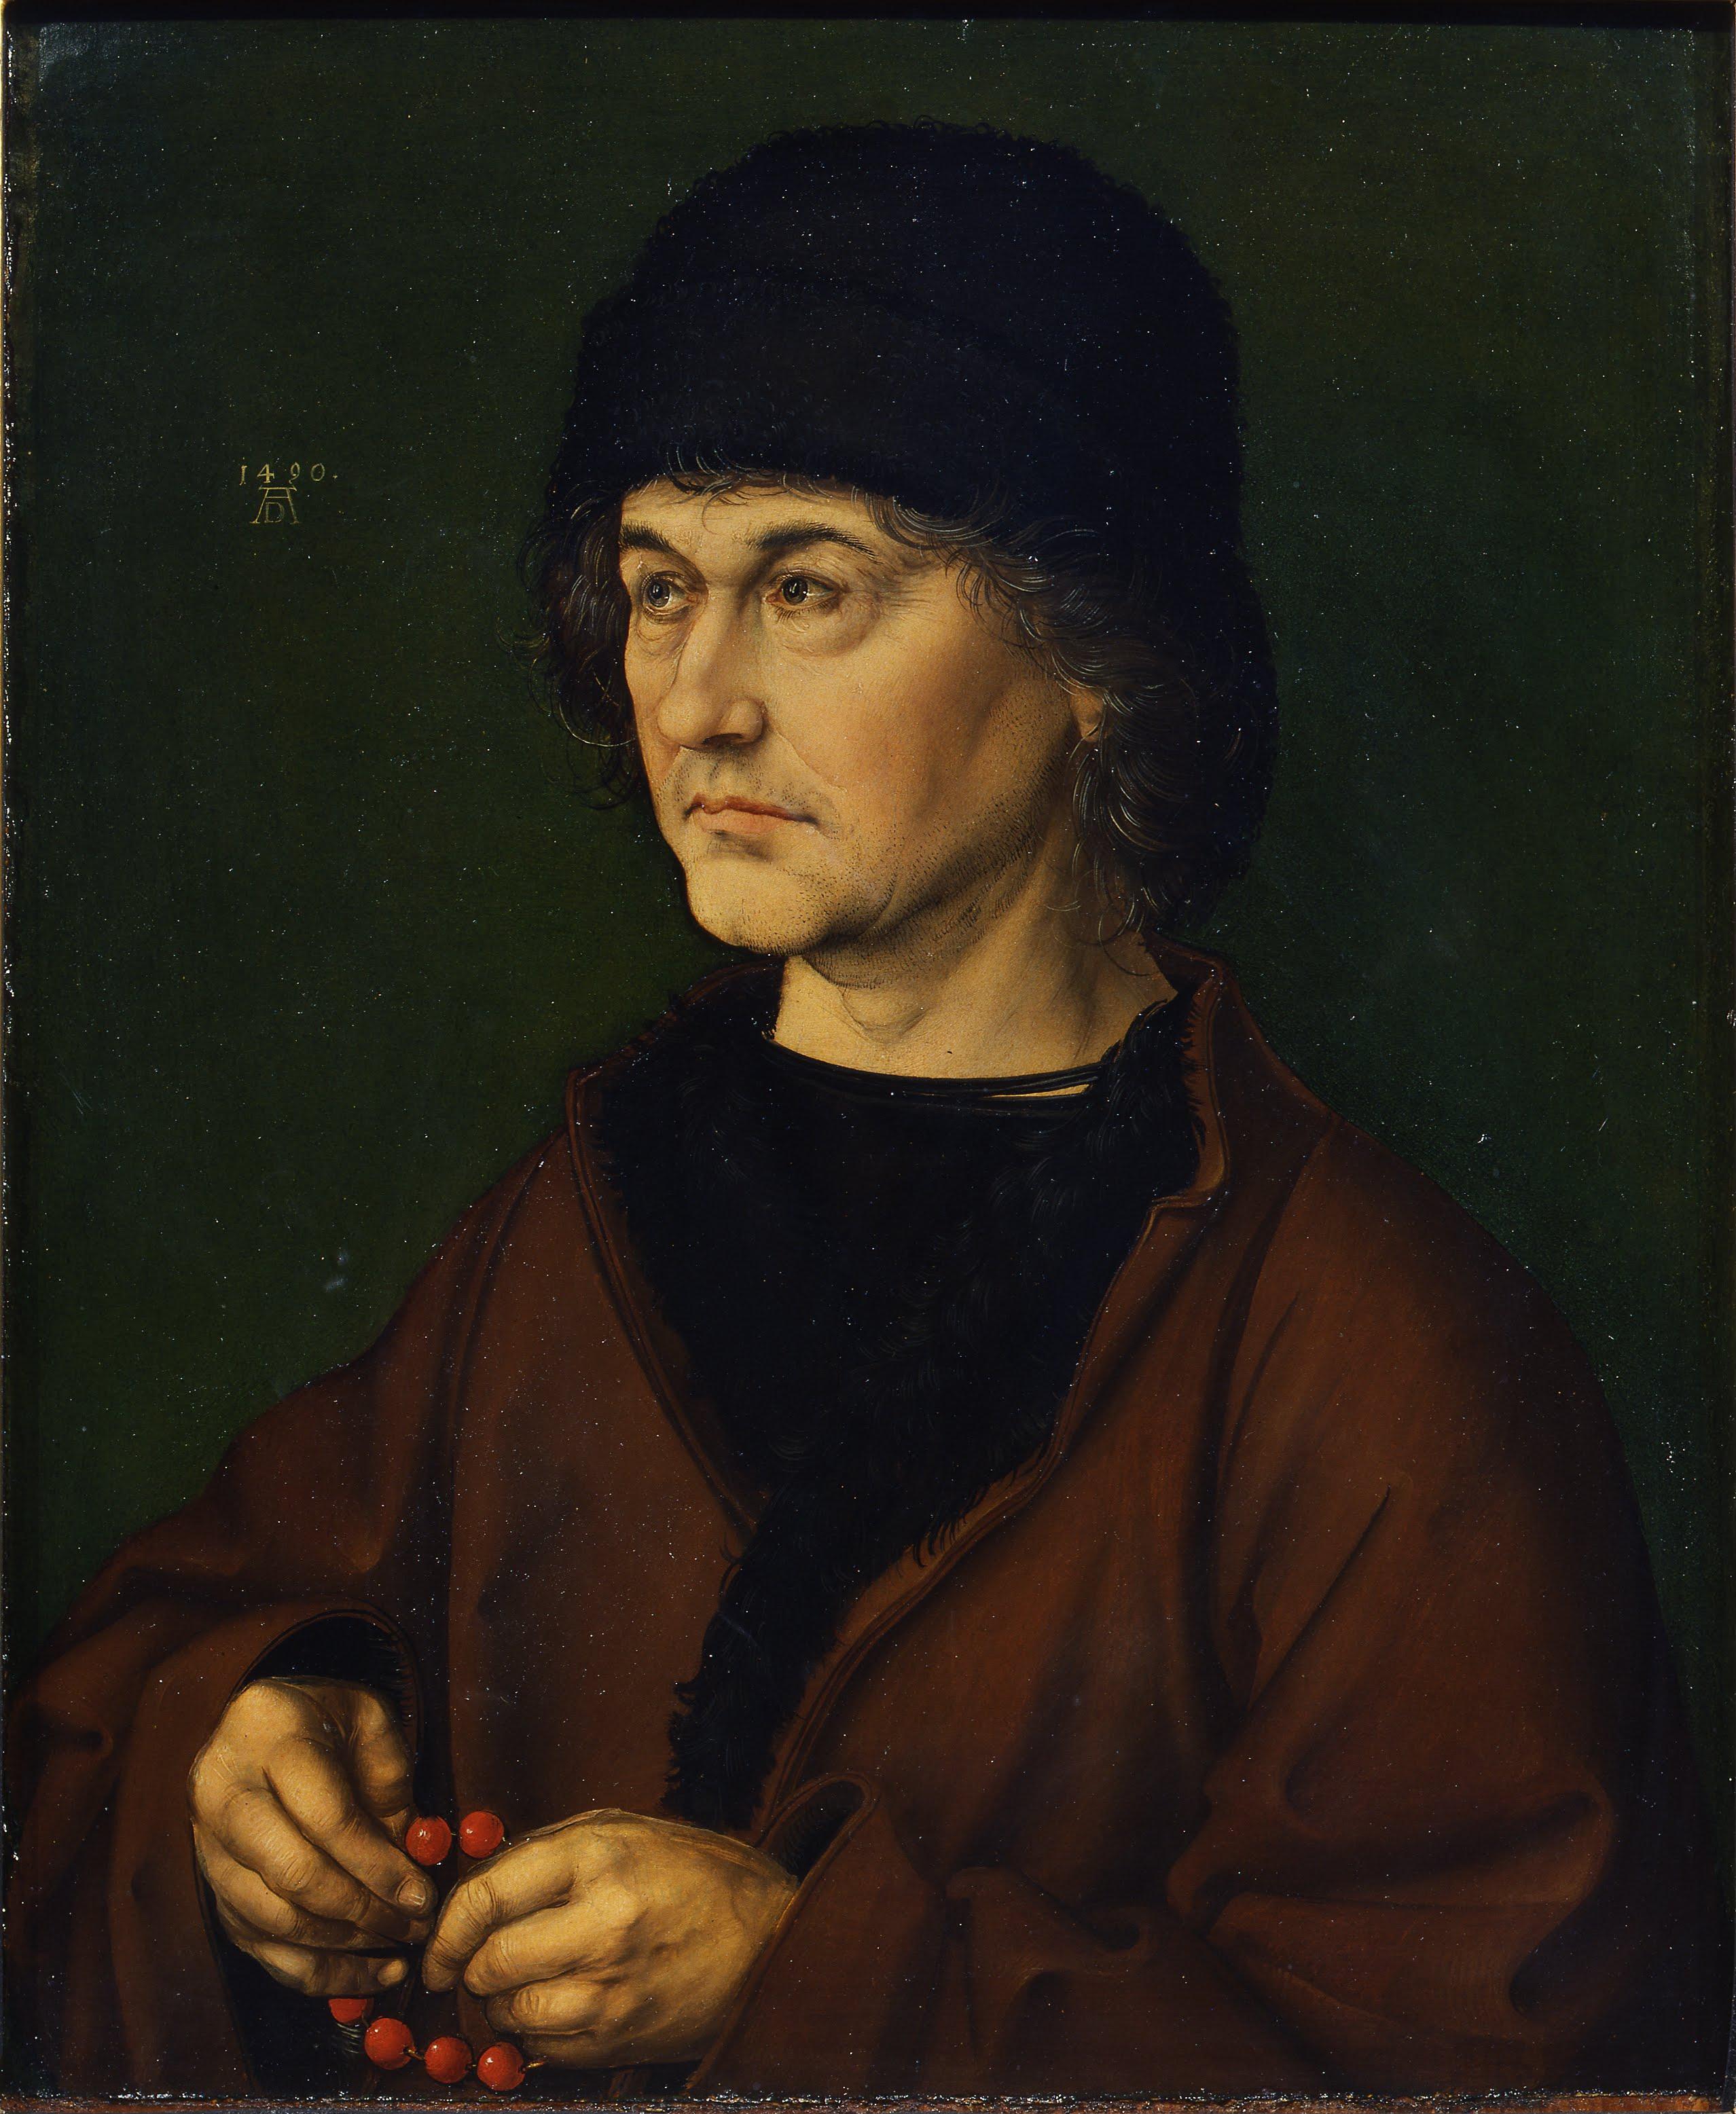 Albrecht Dürer - Ritratto del padre - Google Art Project.jpg 029162756754